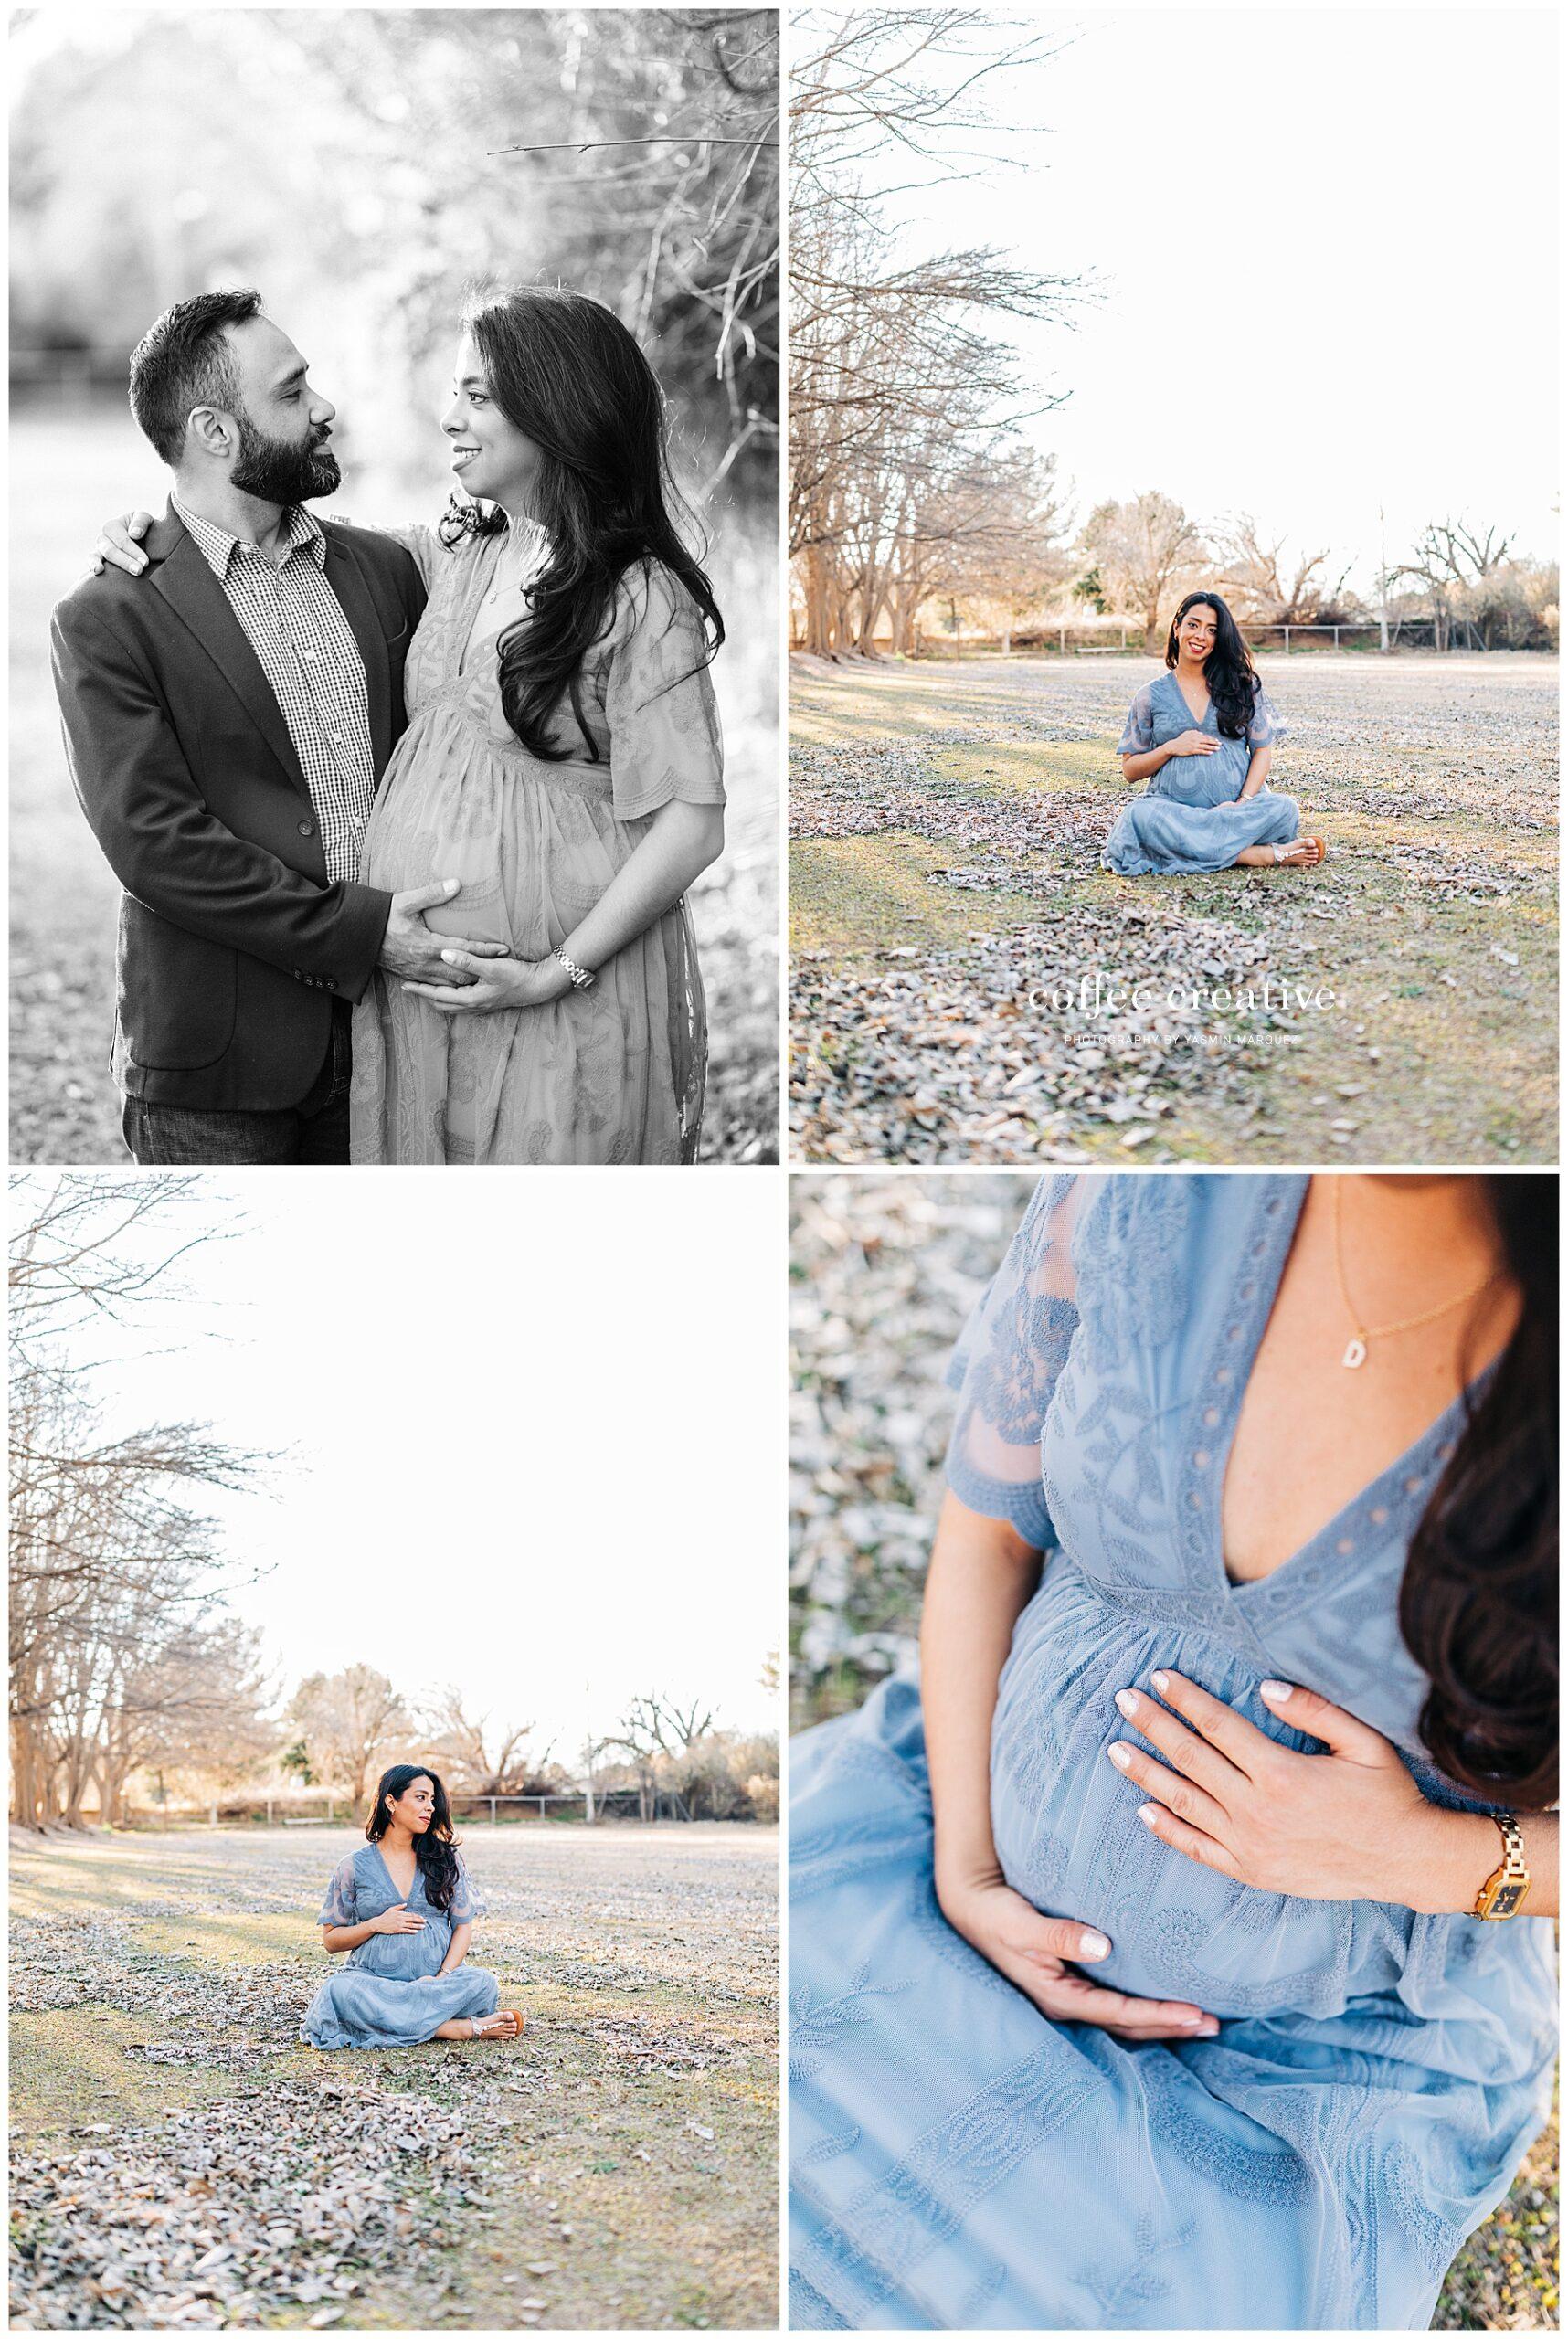 El Paso Texas Maternity Photographer, Outdoor Rustic Spring Maternity Session, El Paso Texas Maternity Photography,